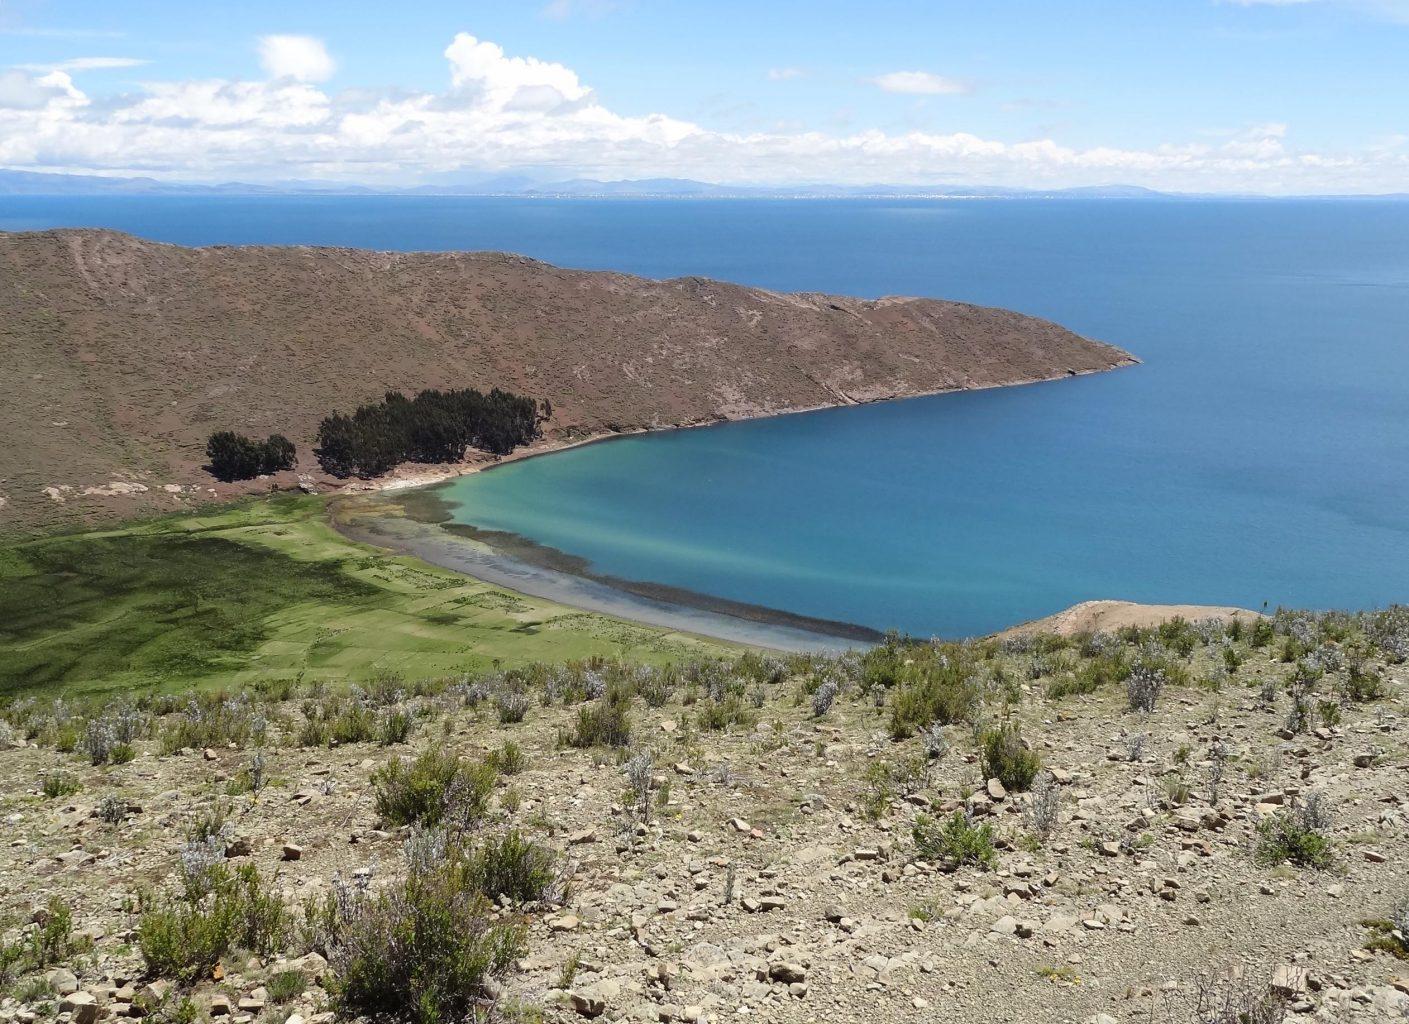 Praia da Isla del Sol, vista durante a caminhada de norte a sul